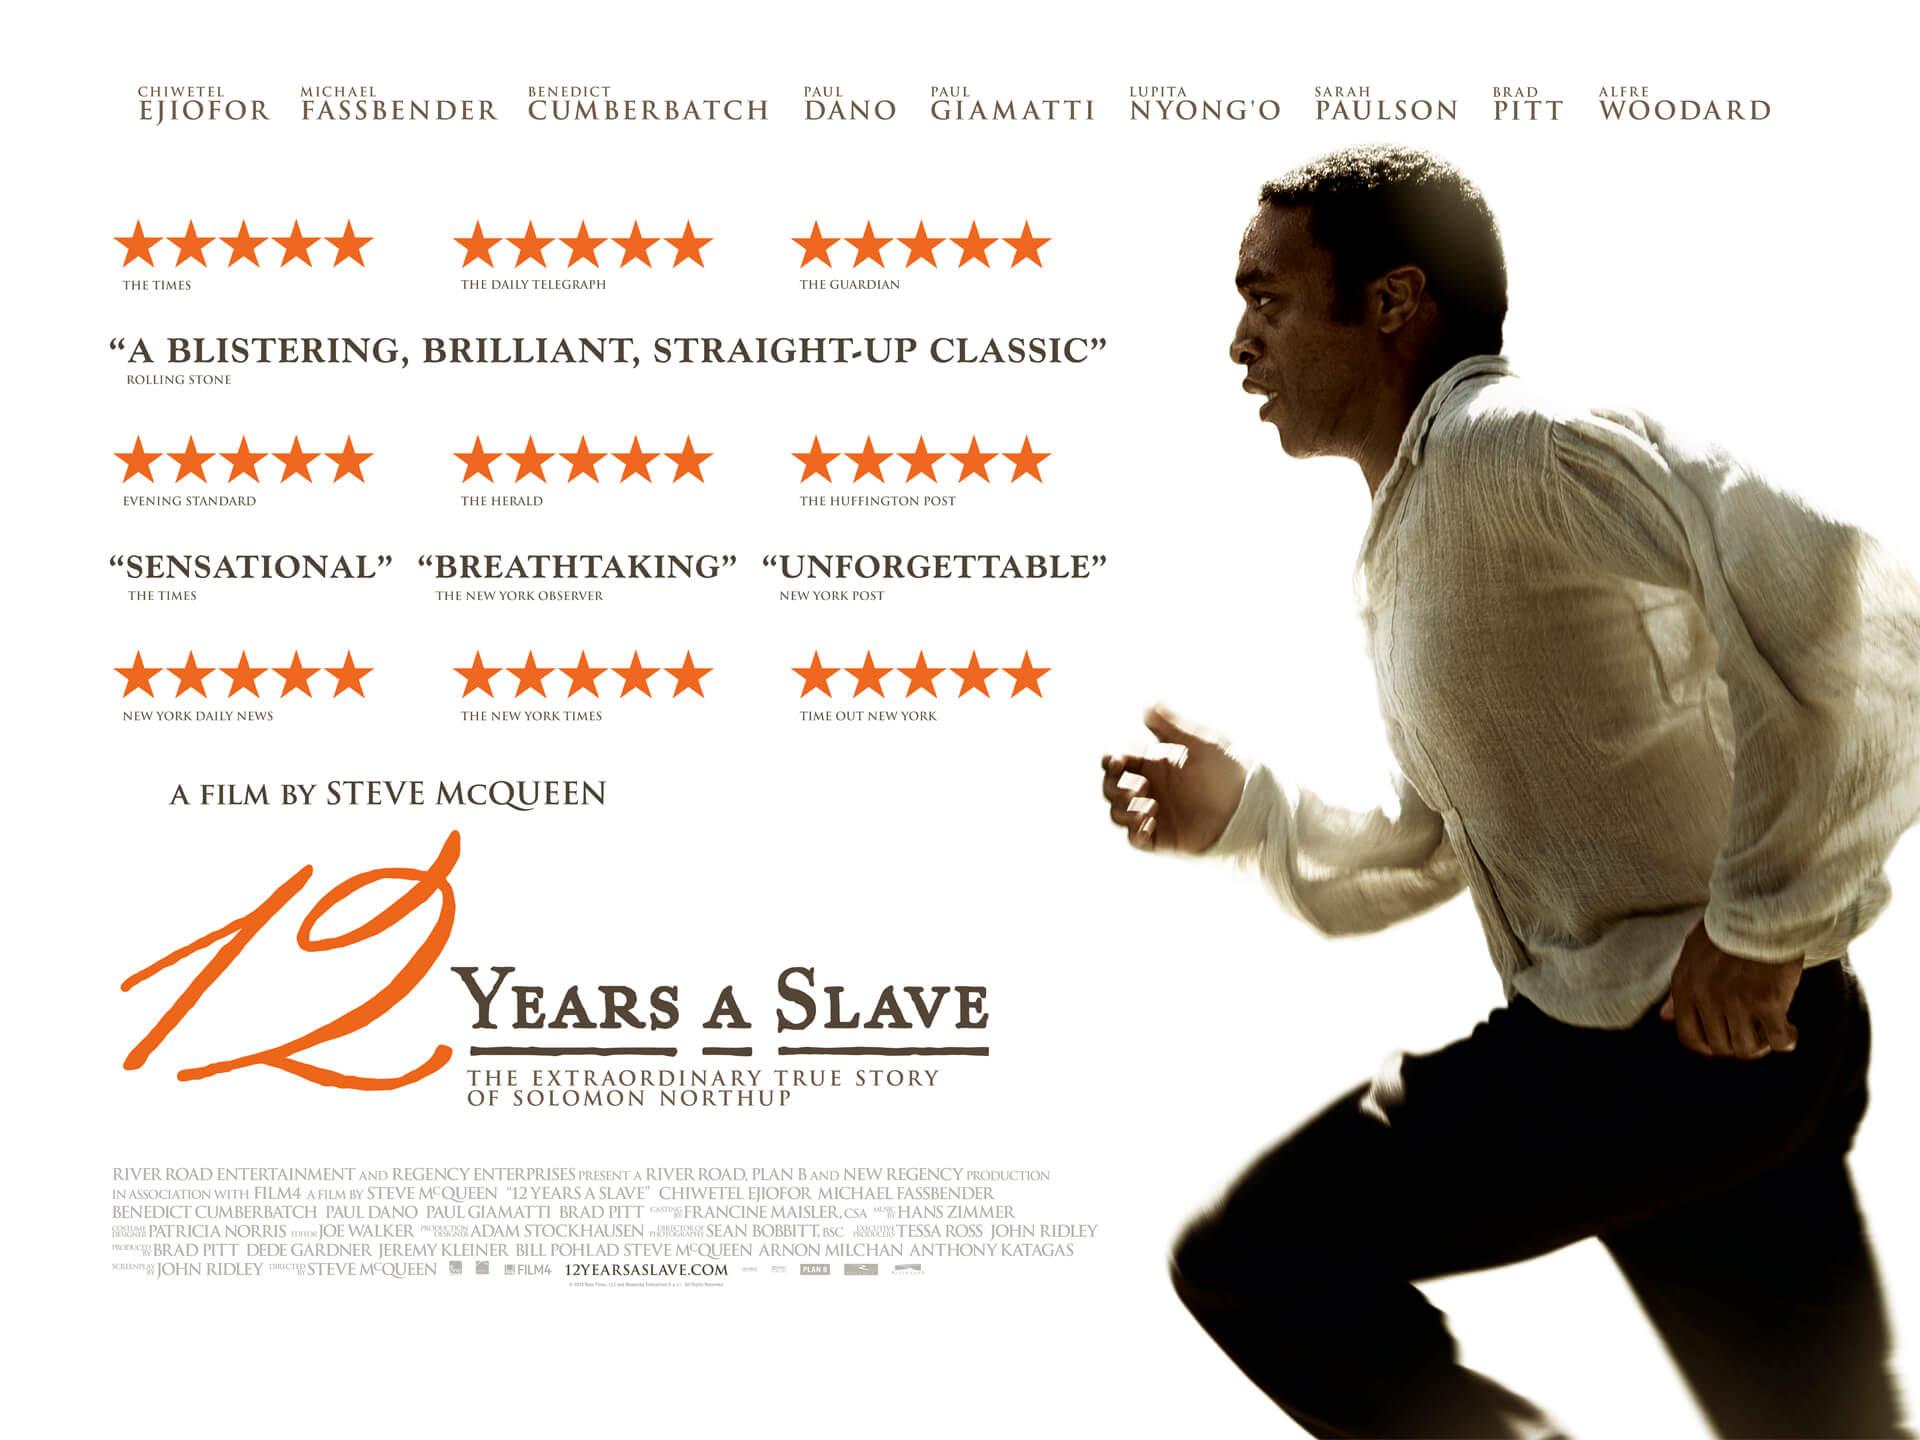 12 years a slave movie summary